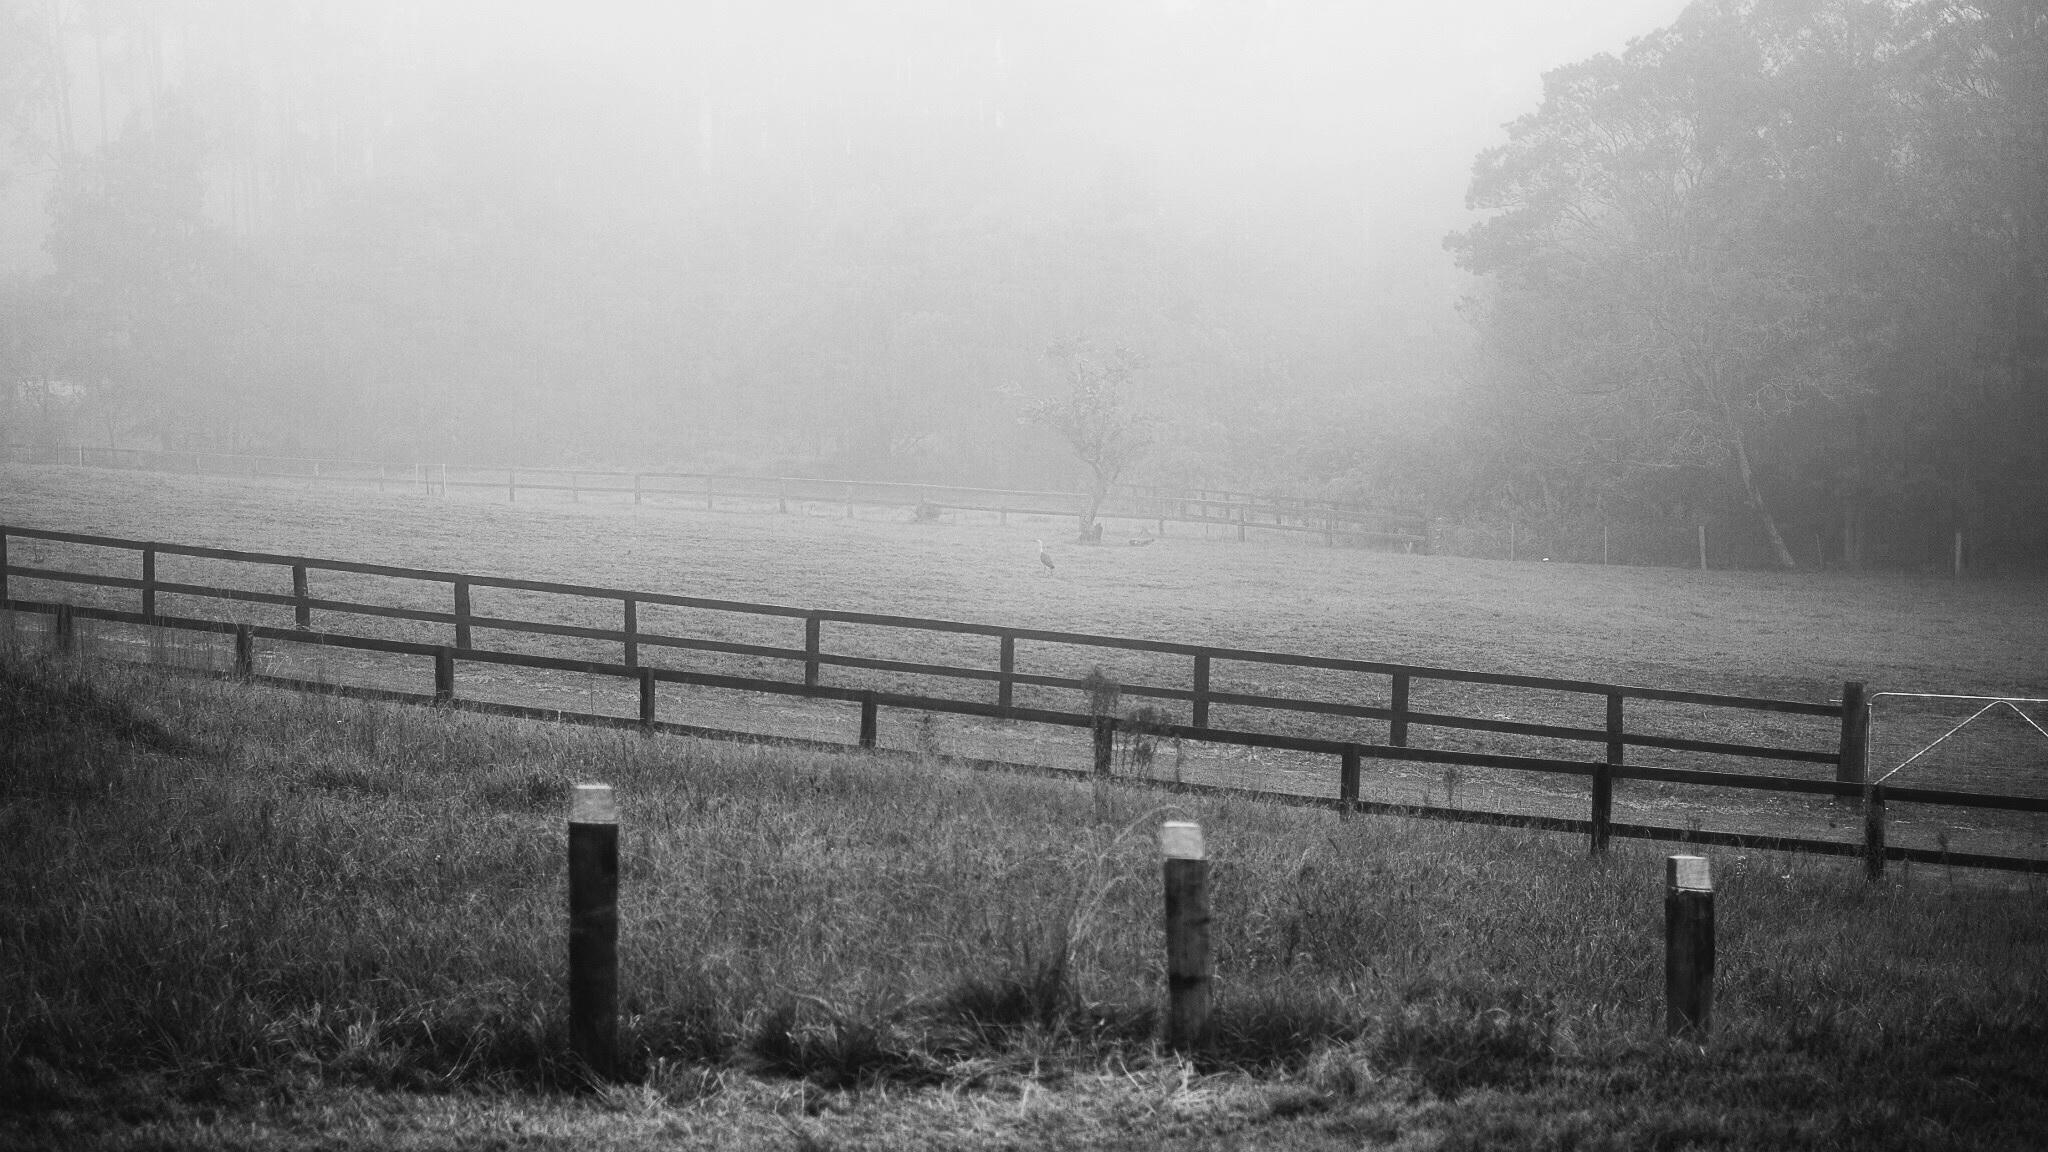 Fog shrouded field